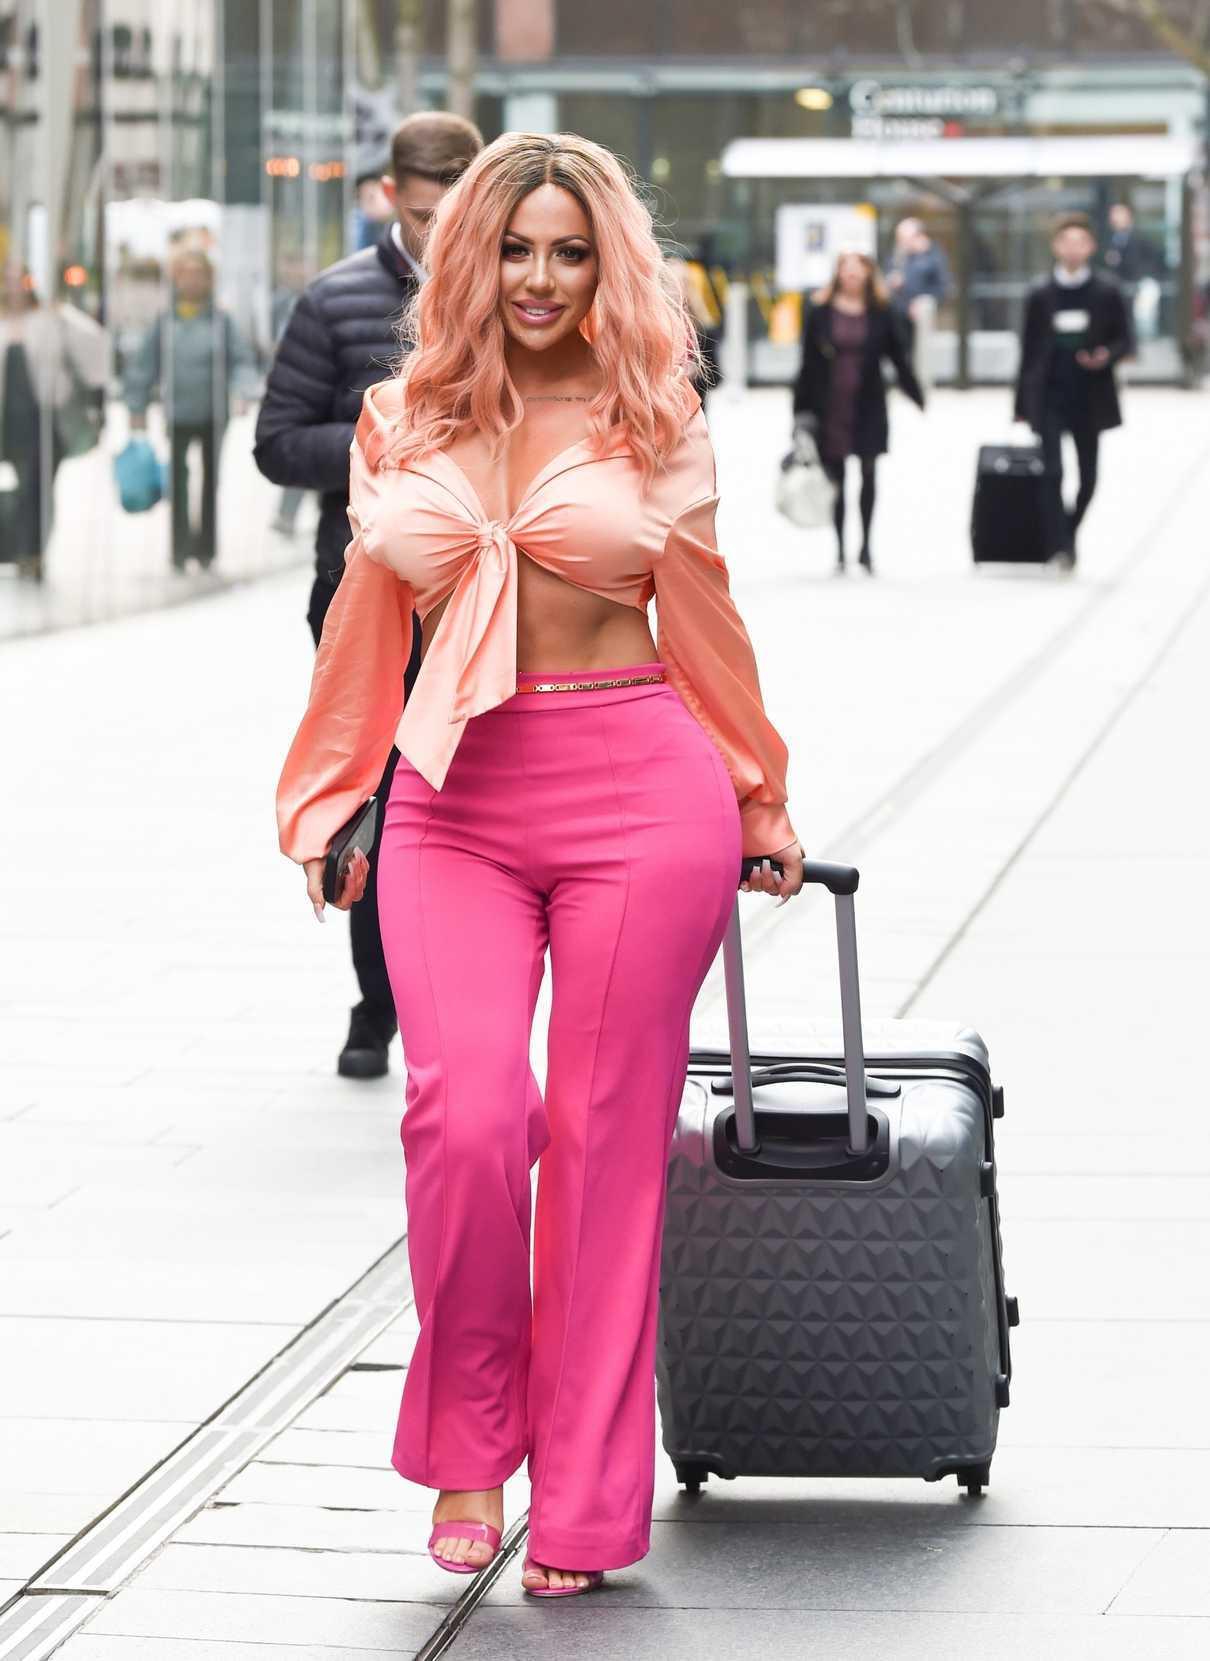 Holly Hagan in a Pink Pants